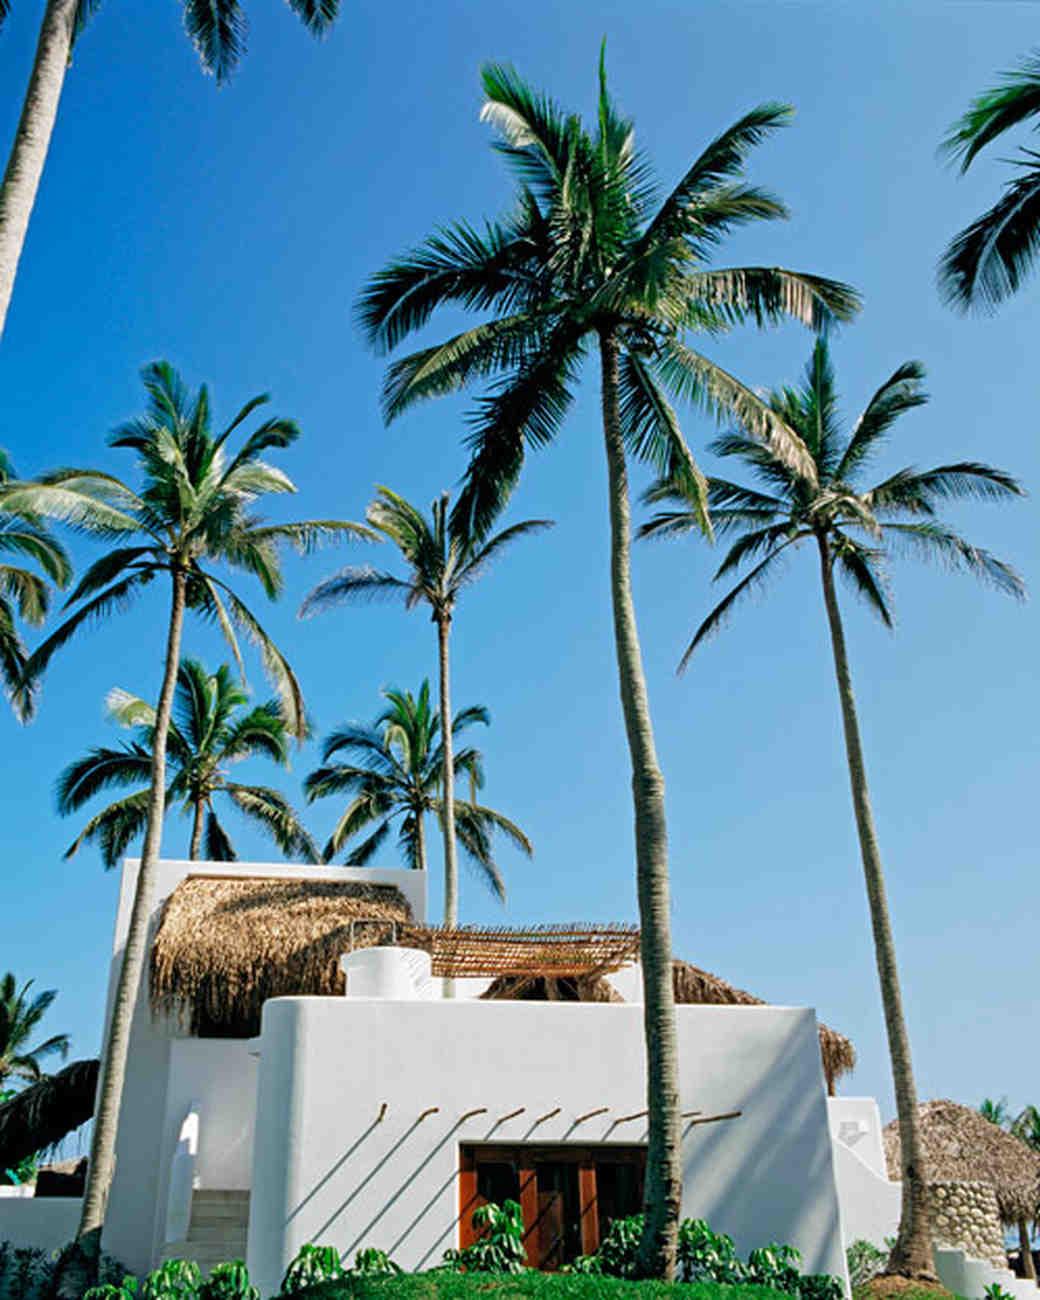 mwd_0111_resort_undine-azucar.jpg